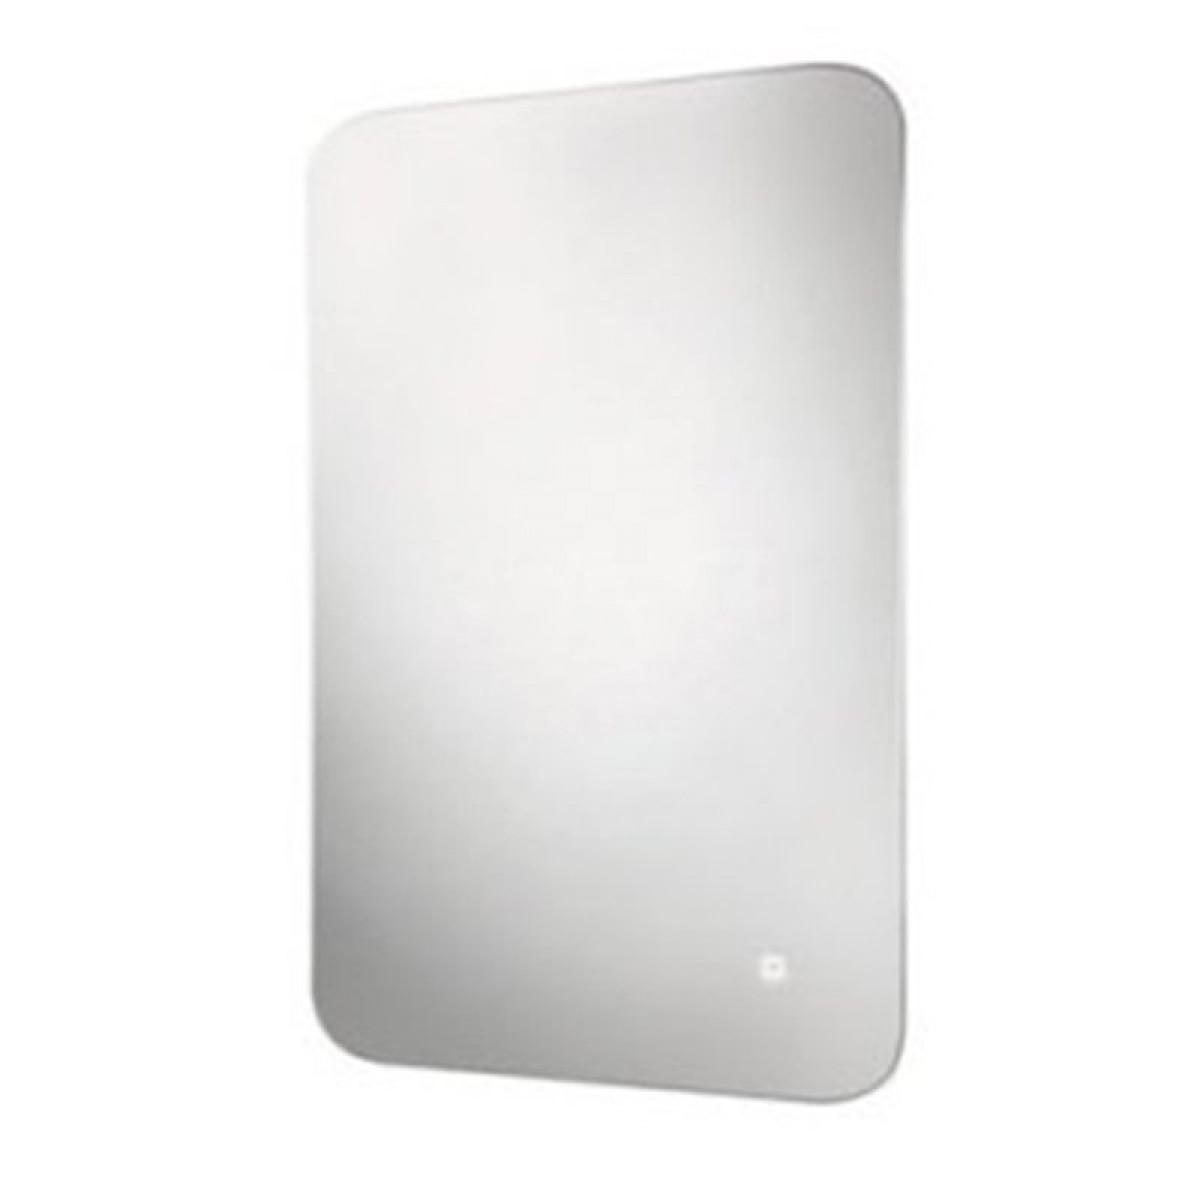 HIB Ambience 50 LED Steam Free Bathroom Mirror | 79100000